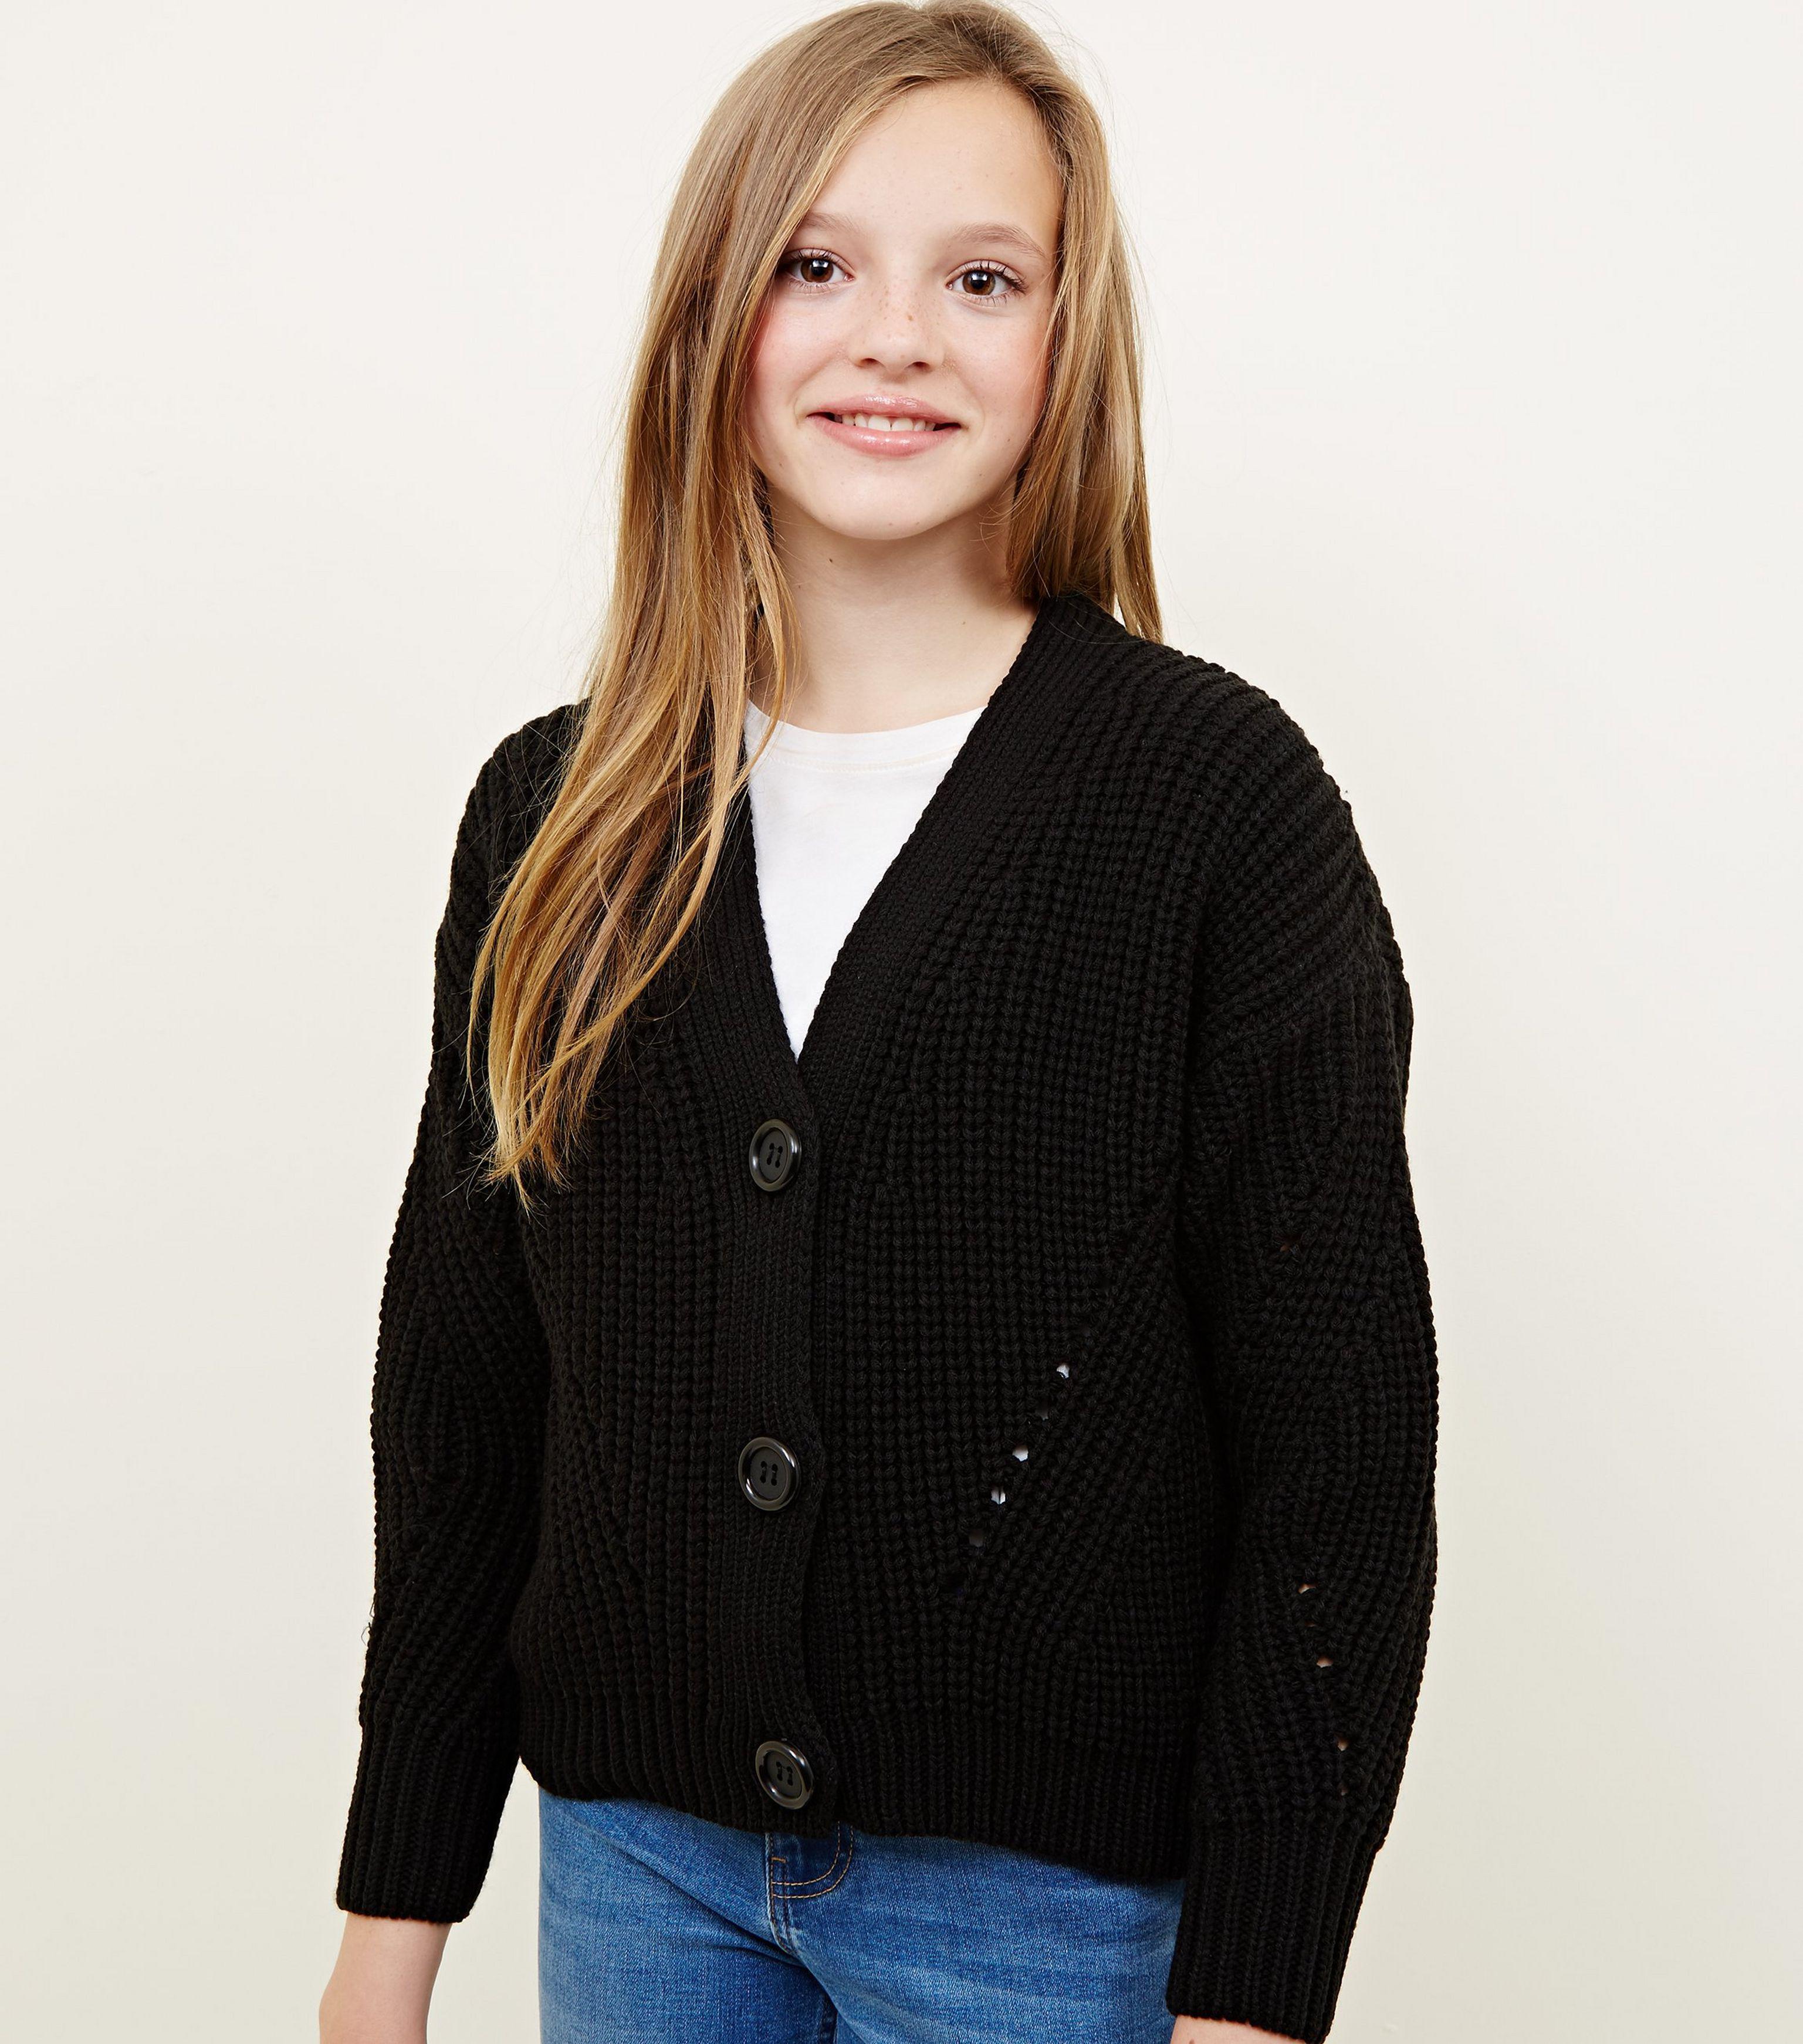 e9f48db145 New Look Girls Black Chunky Ribbed Cardigan in Black - Lyst